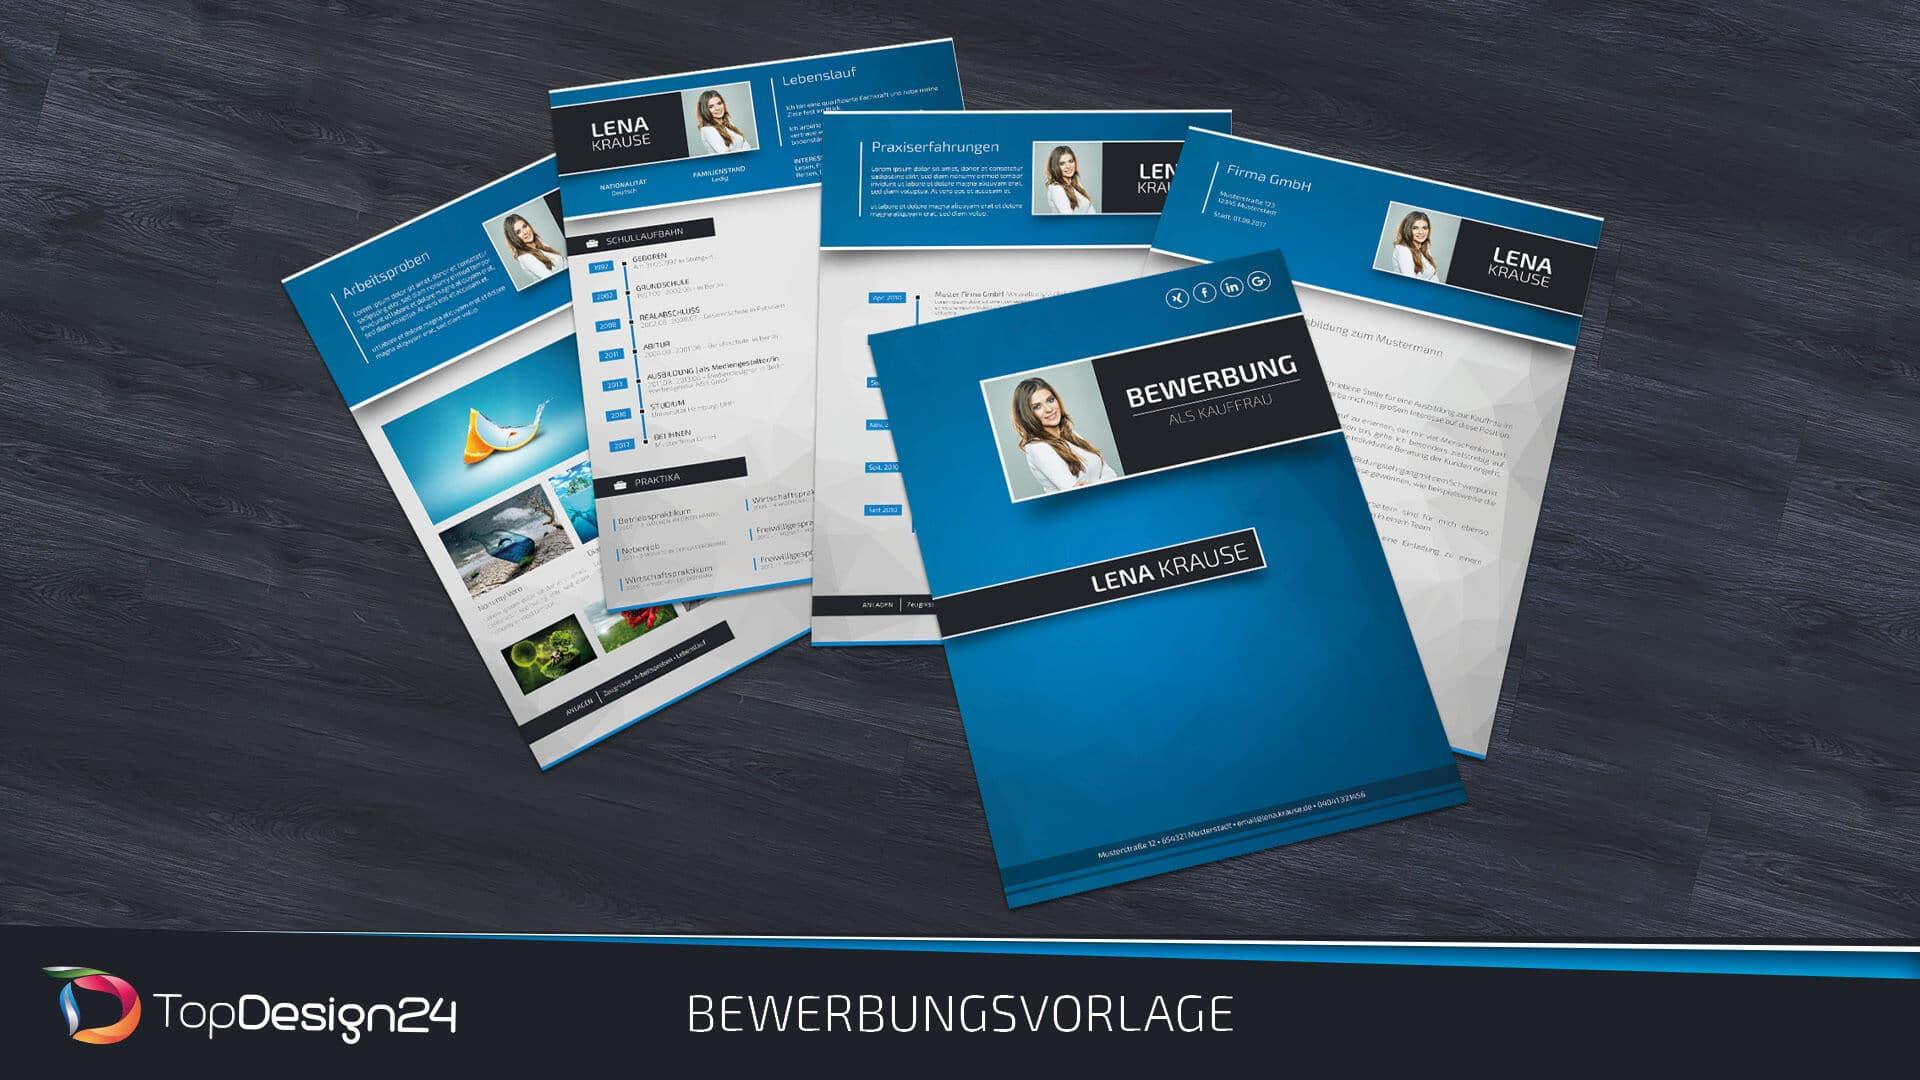 Großzügig Online Nachrichtenredaktion Lebenslauf Bilder - Entry ...